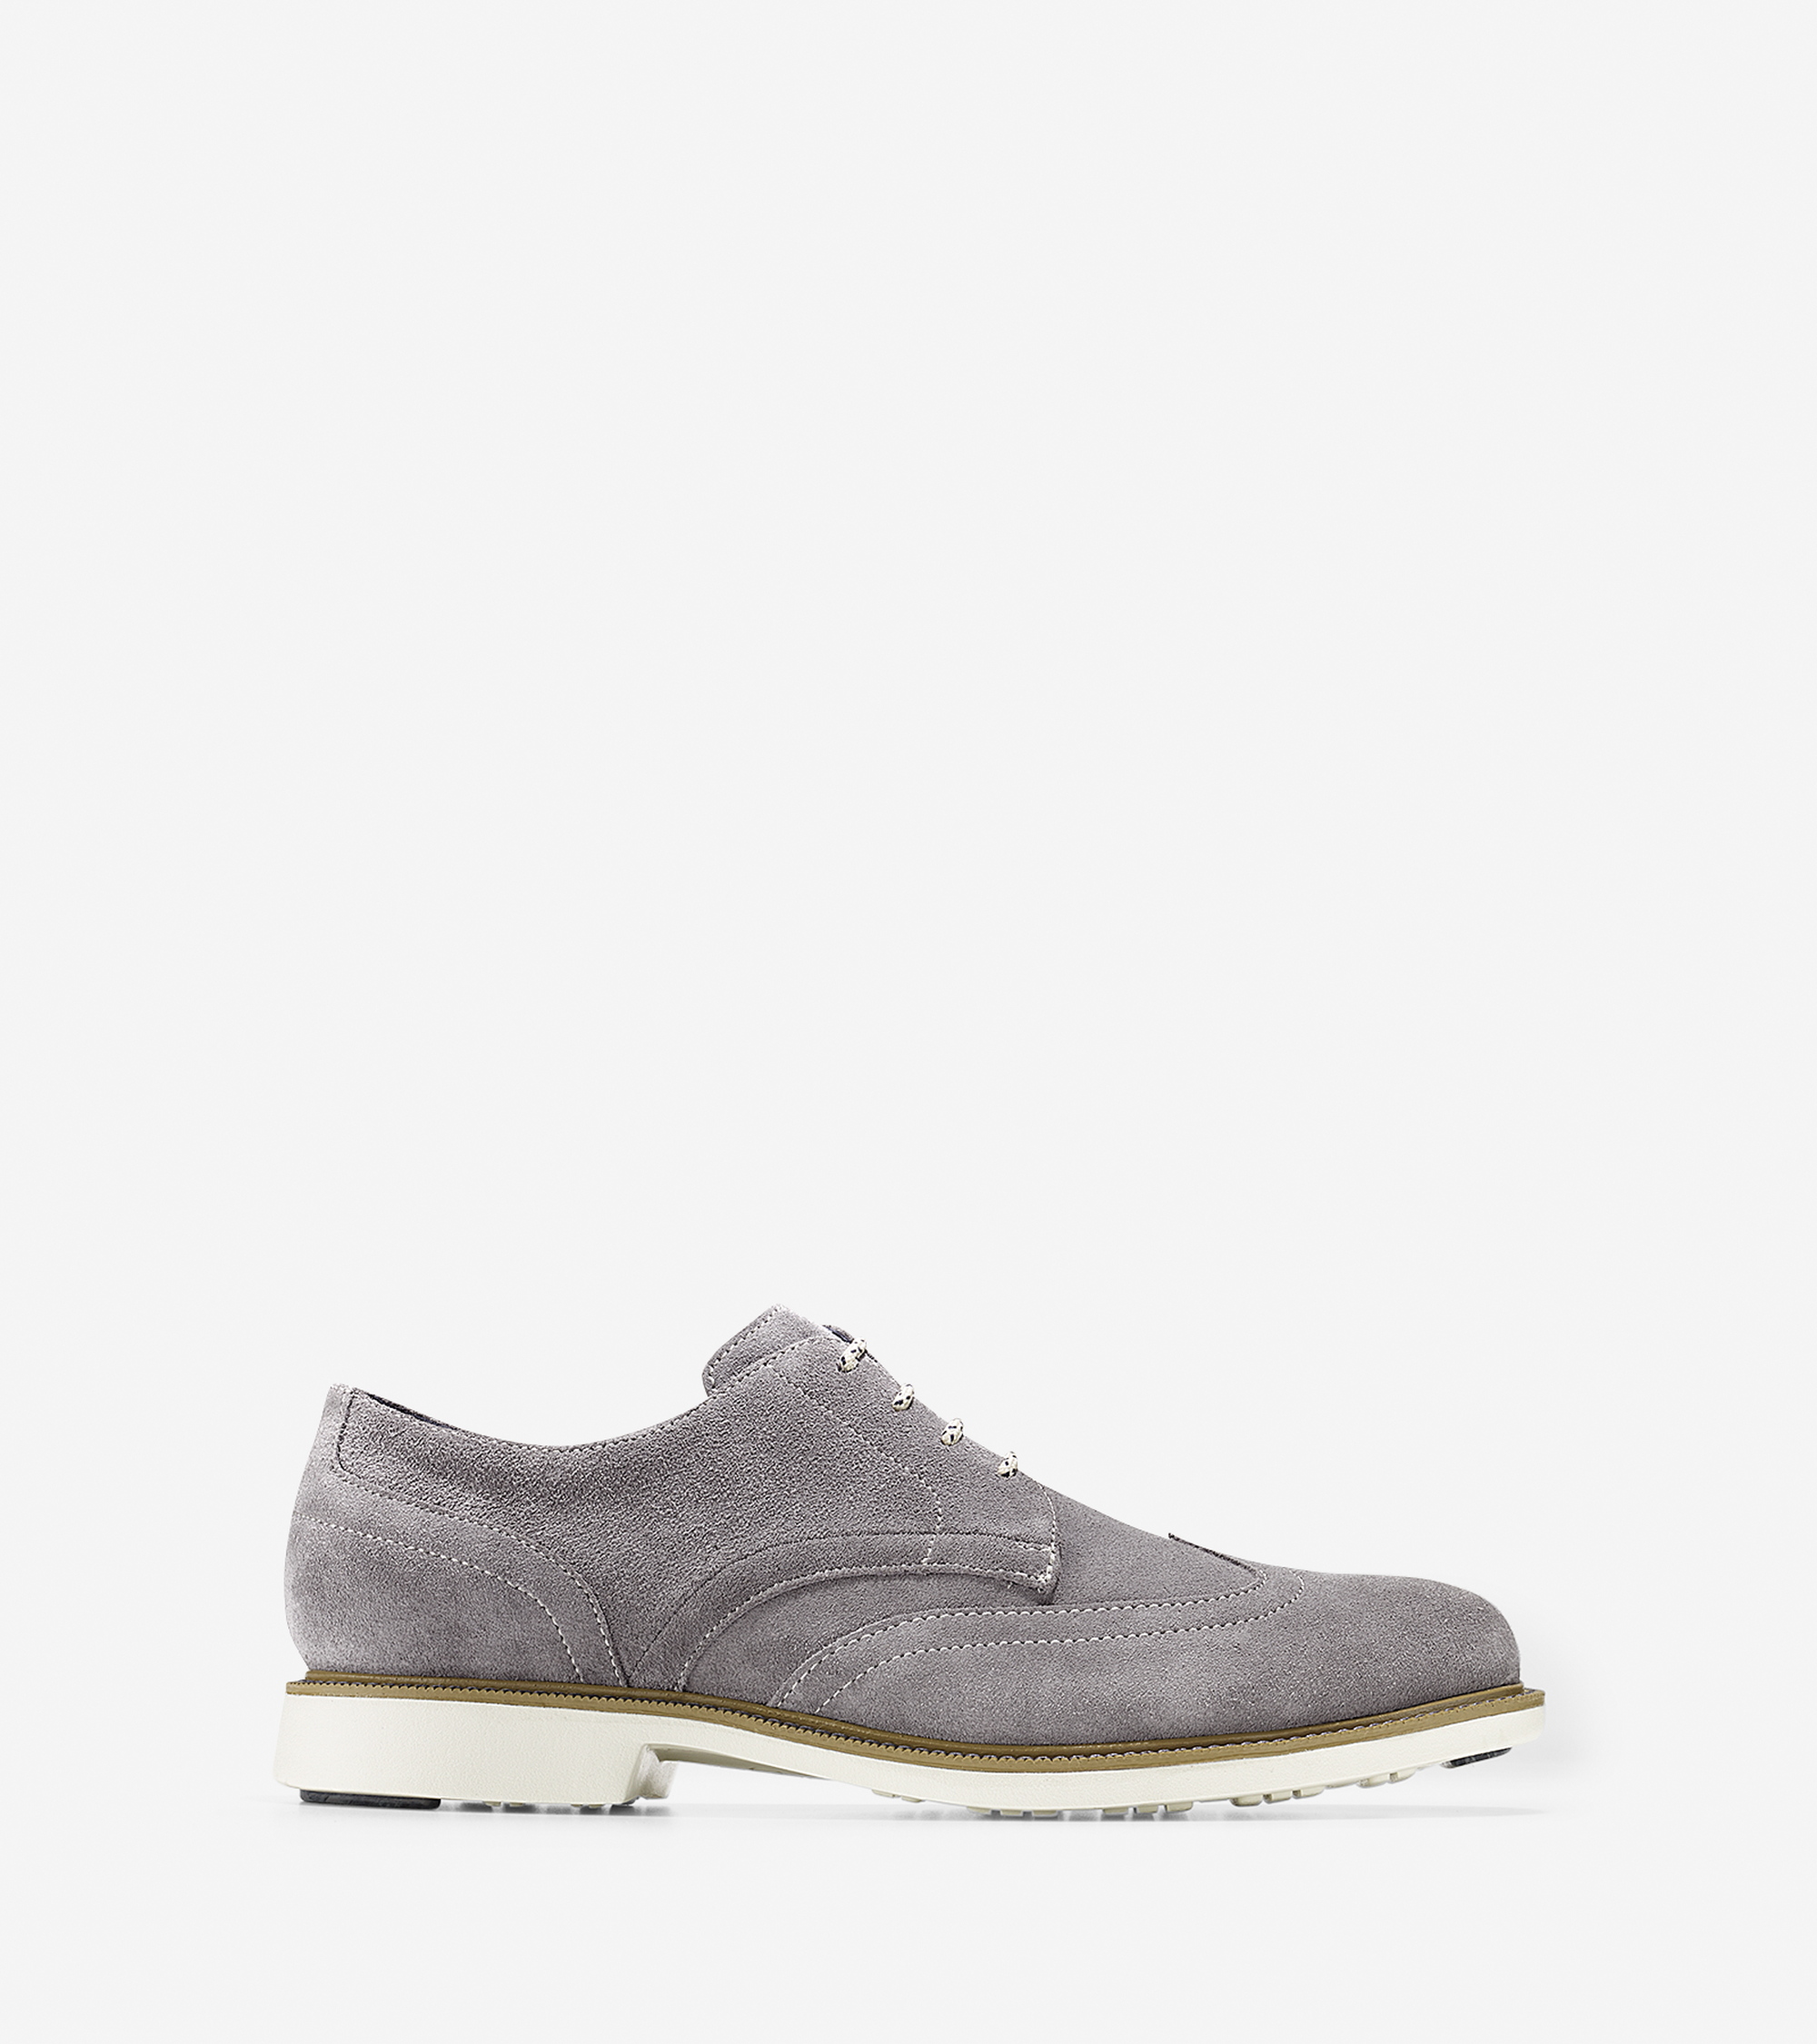 Gap Suede Wingtip Dress Shoes